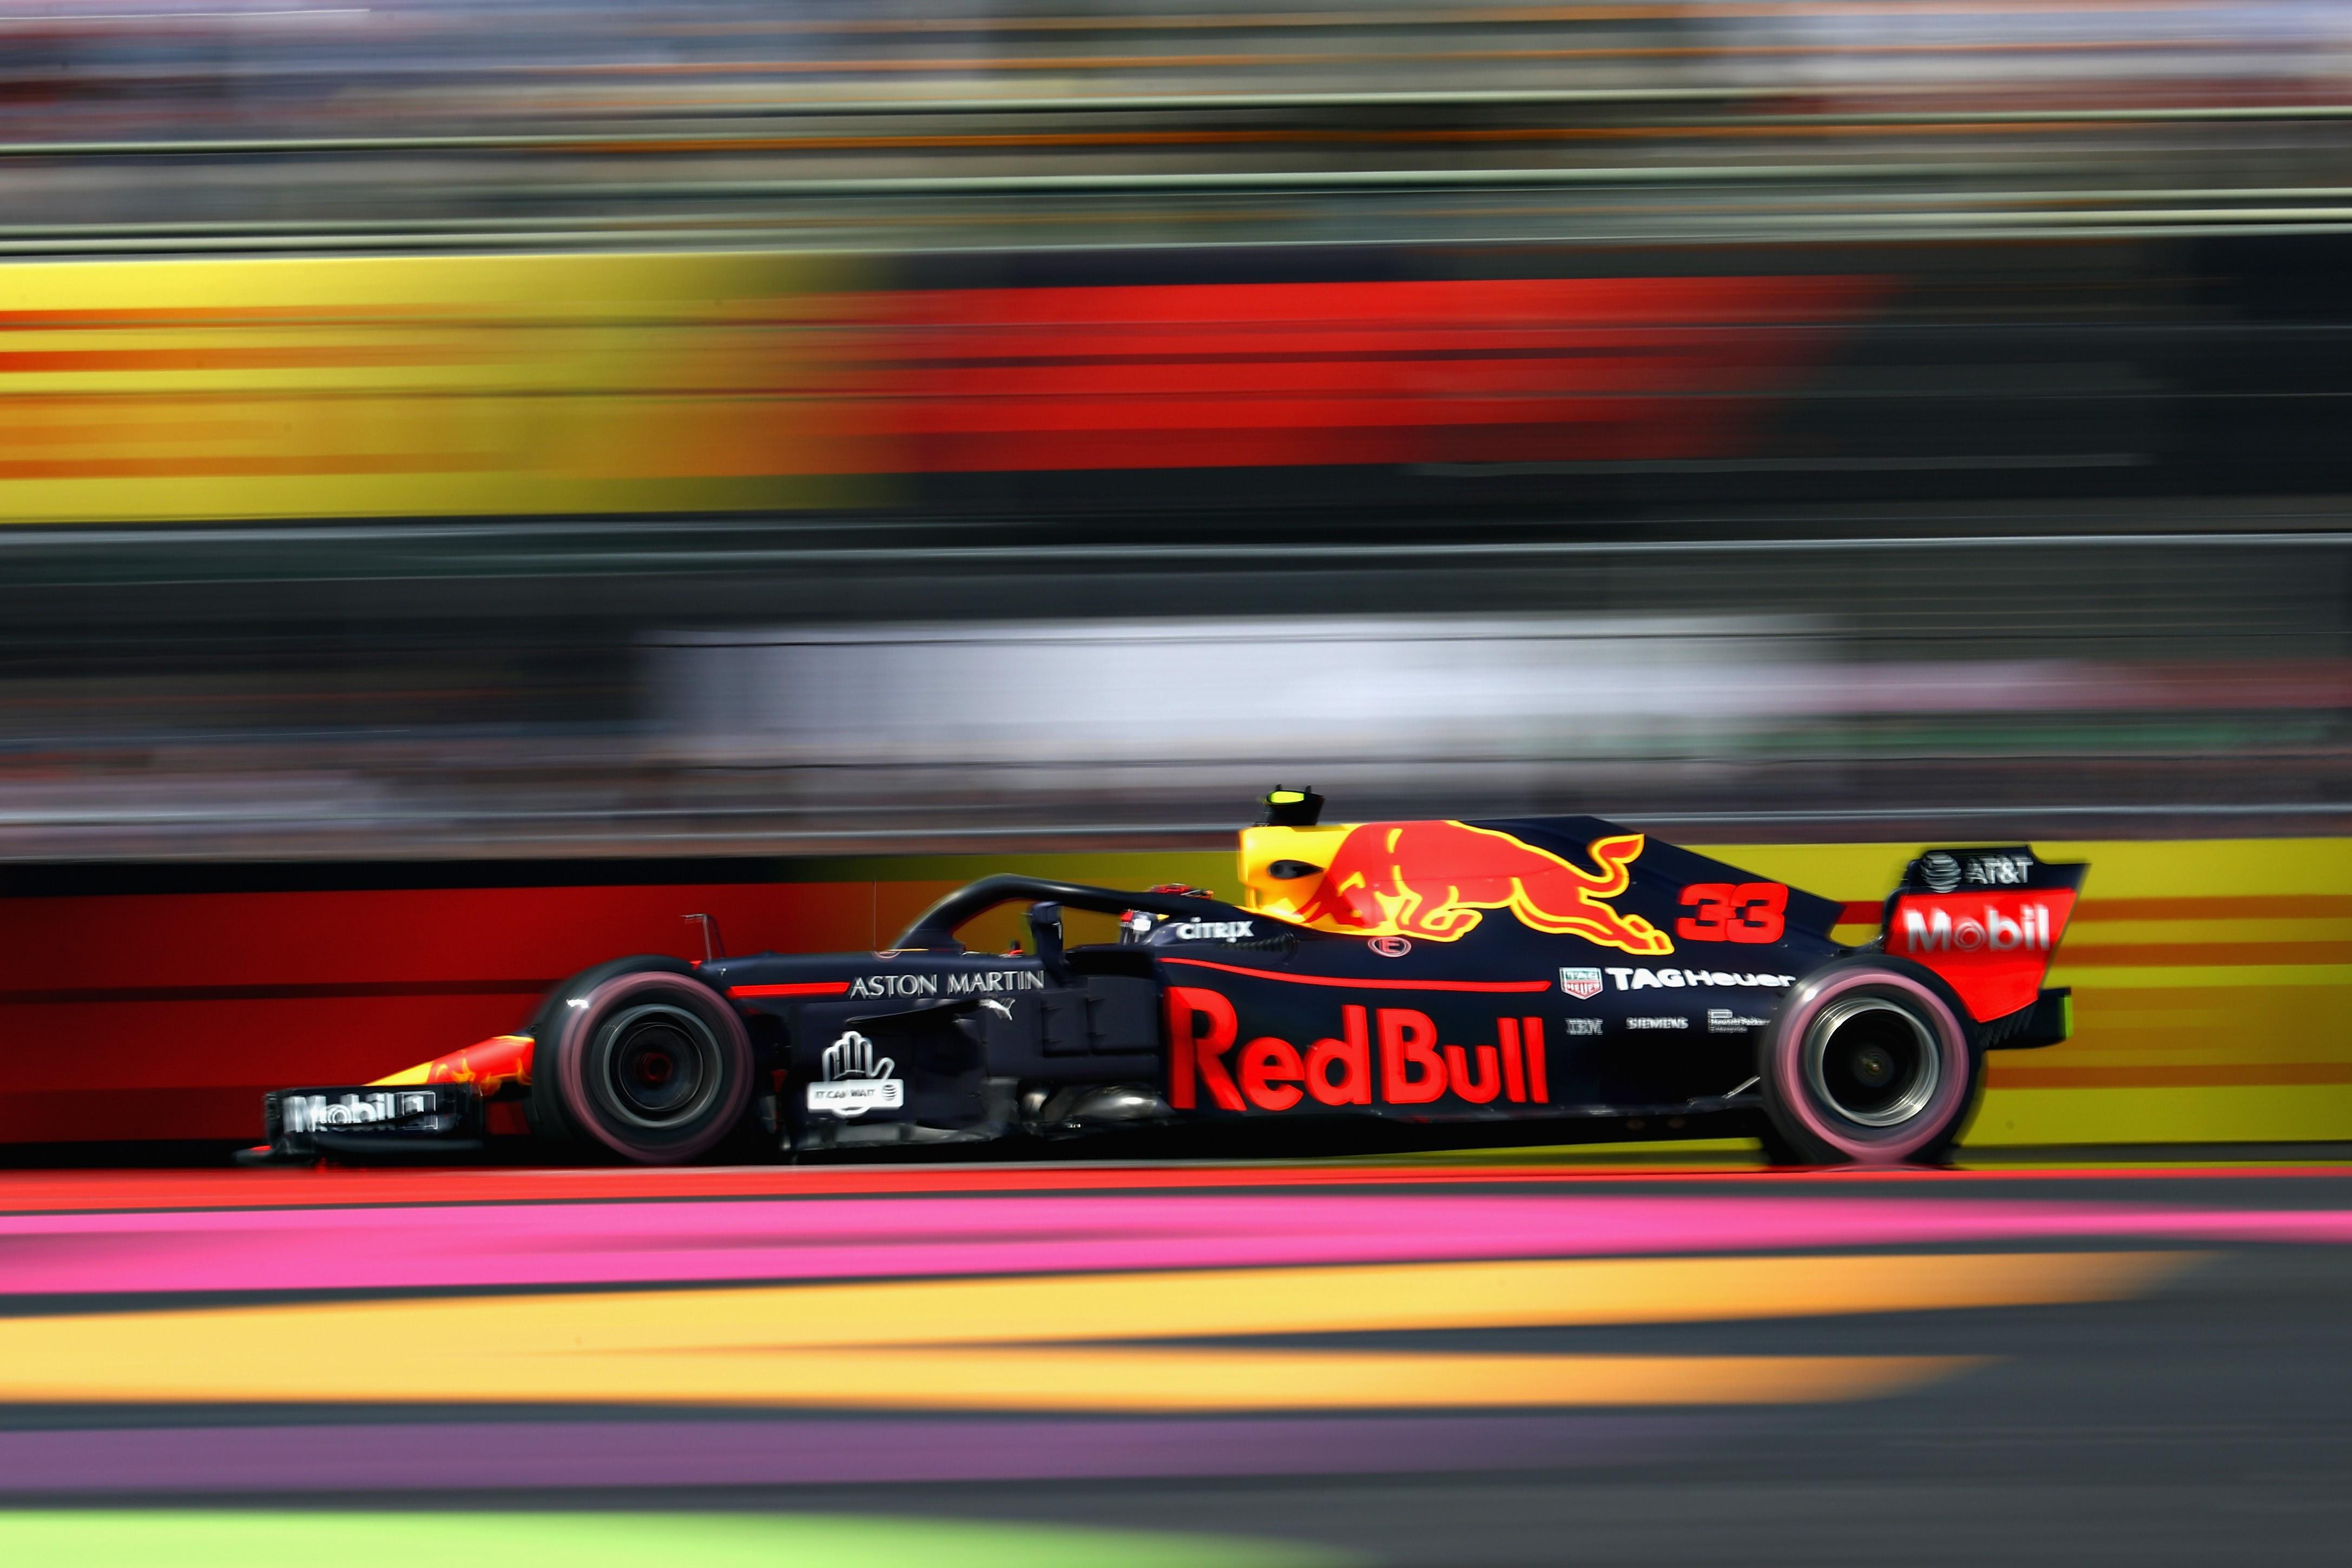 Max Verstappen (Red Bull) au Grand Prix du Mexique 2018